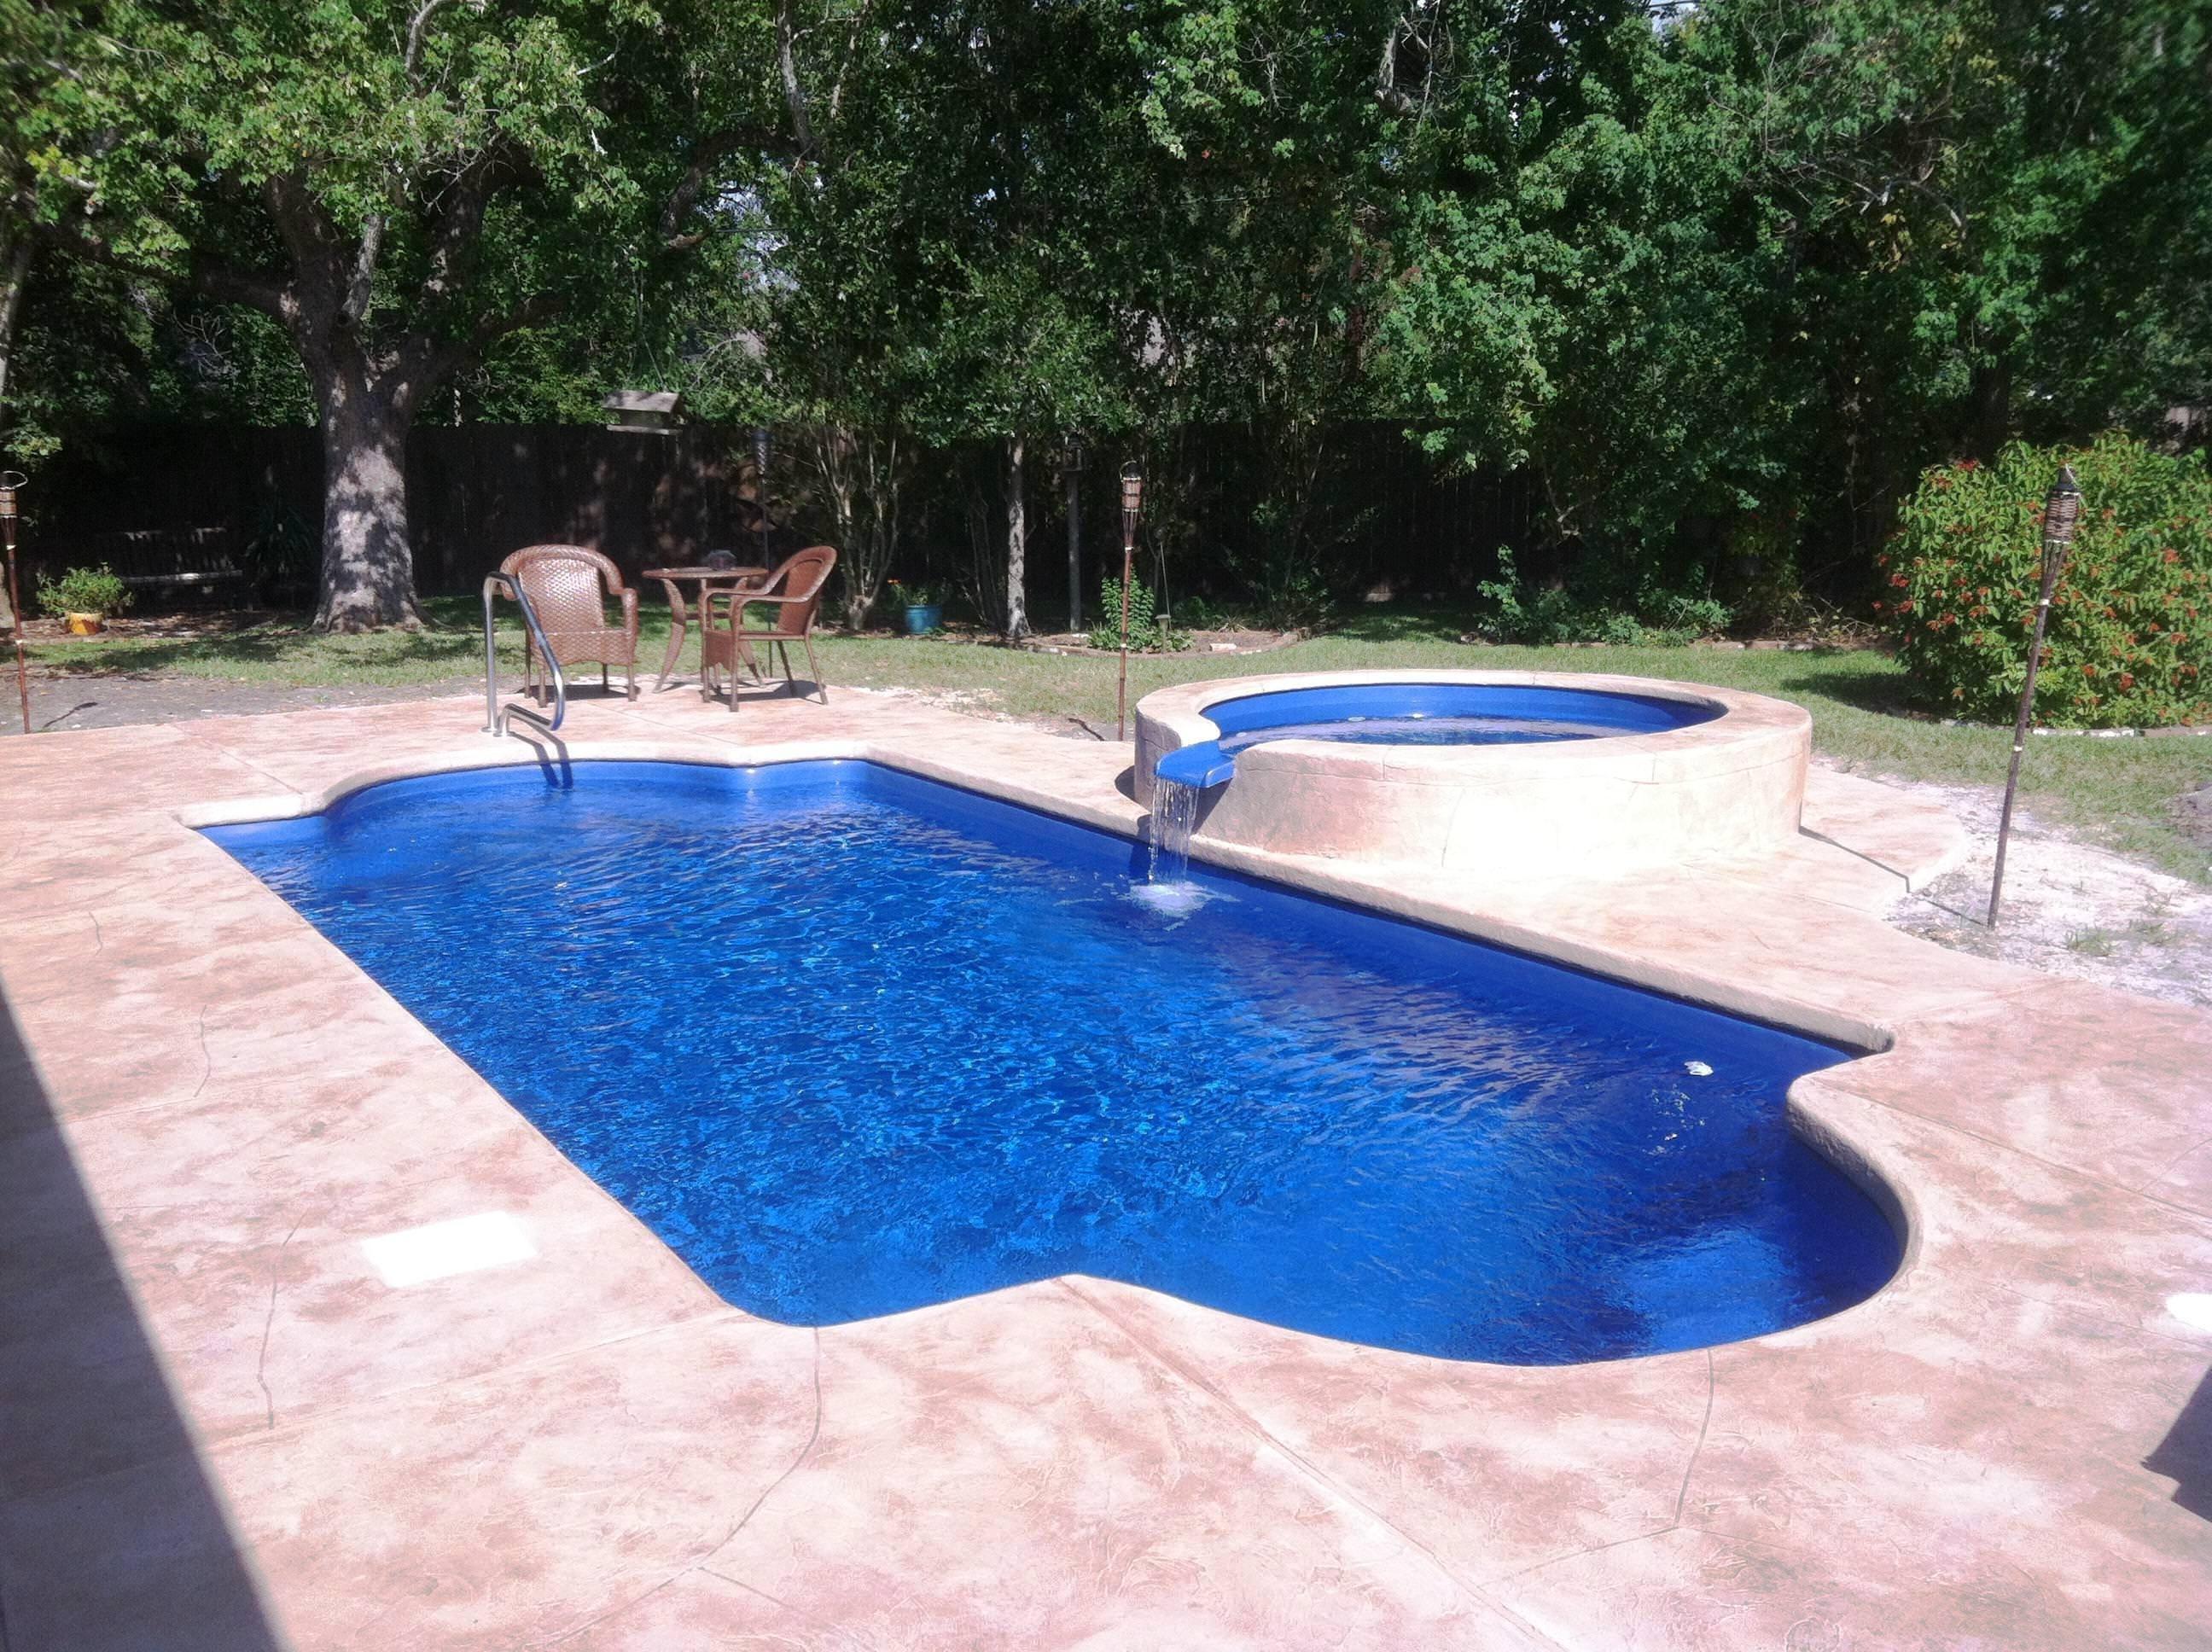 Fiberglass Semi Inground Pool Kits — Randolph Indoor and Outdoor Design